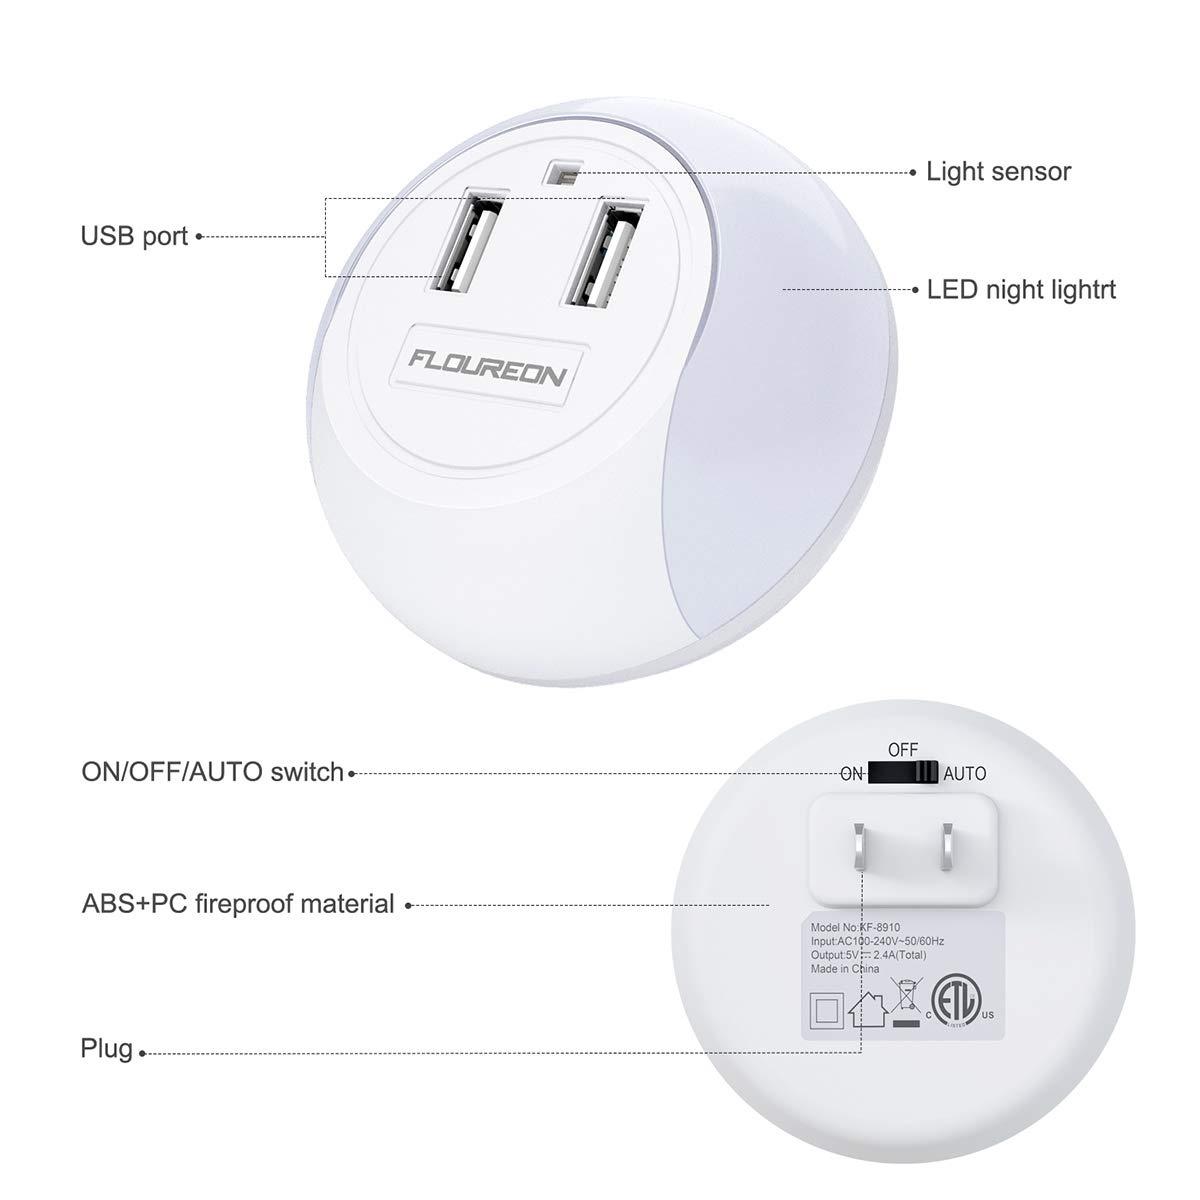 Floureon KF-8910 Led Night Light USB Charger Dusk to Dawn Sensor Dual USB Wall Plate Phone Charger (2 Pack)